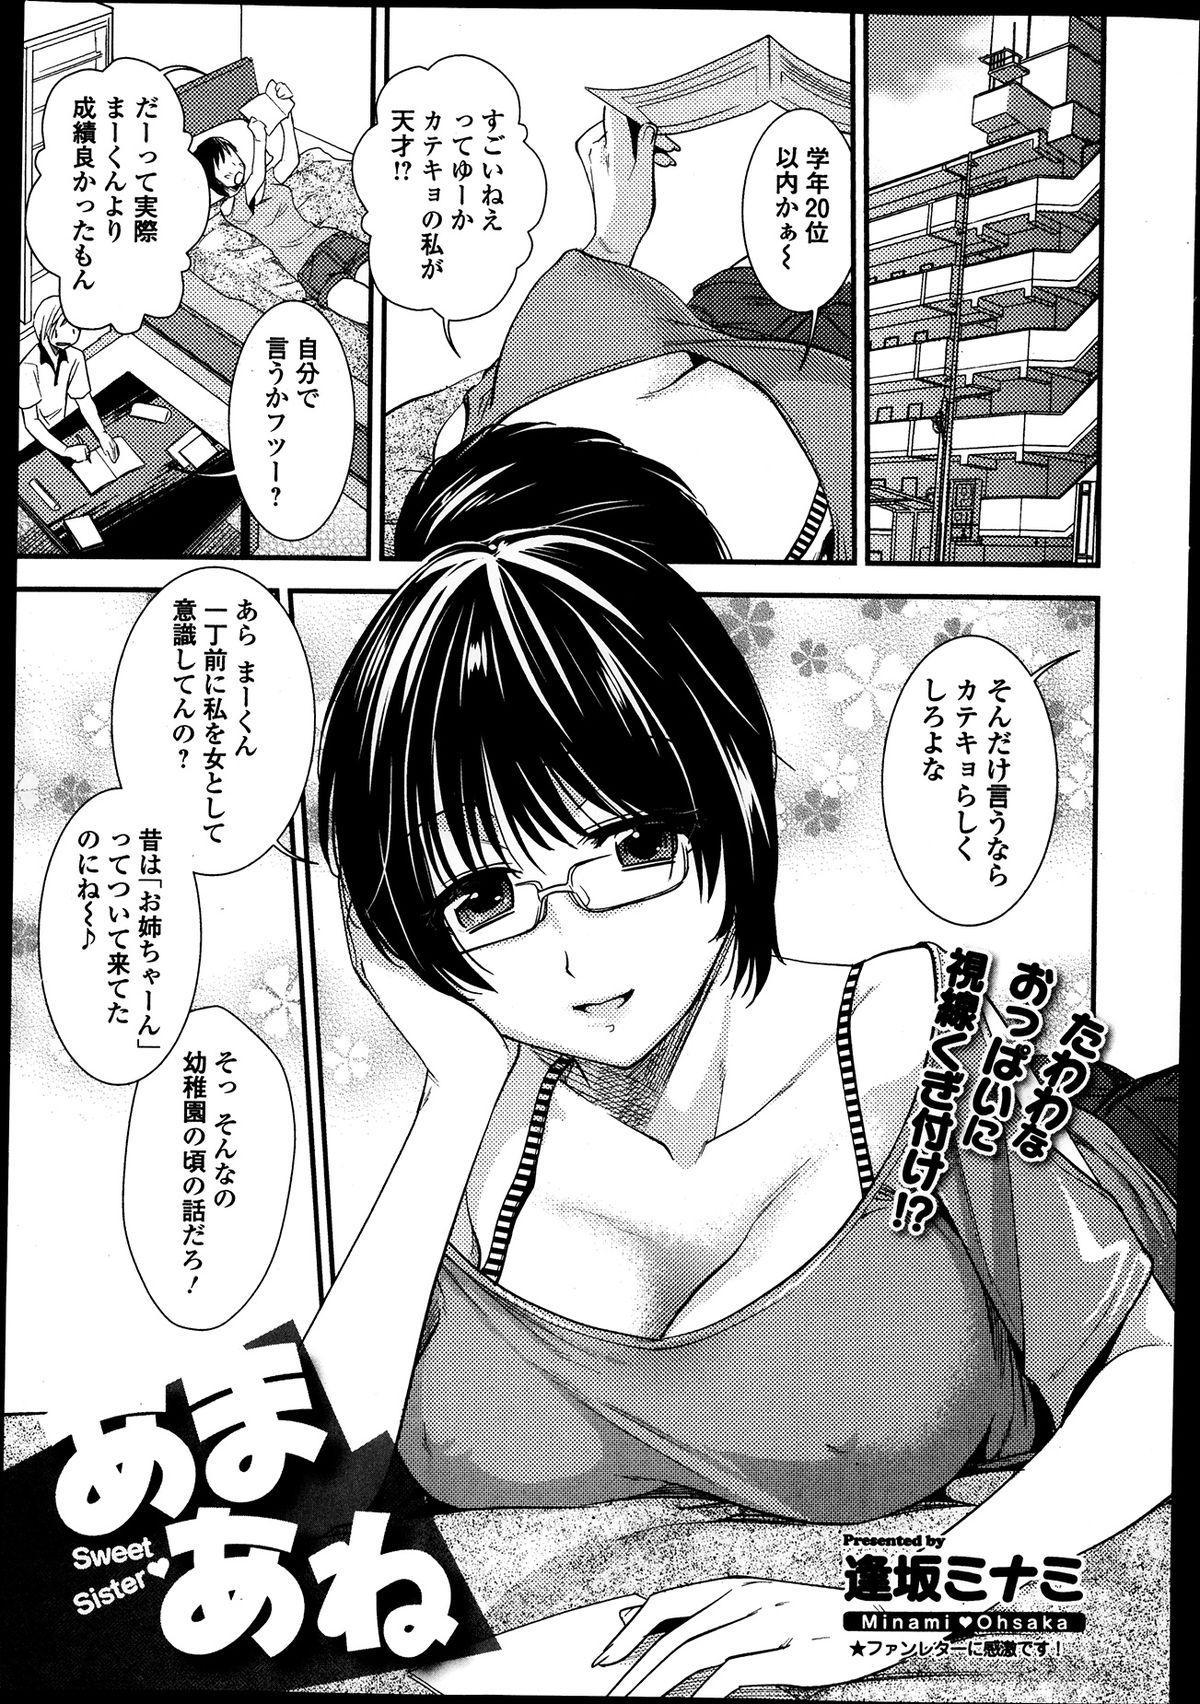 Bishoujo Kakumei KIWAME Road Vol.9 26